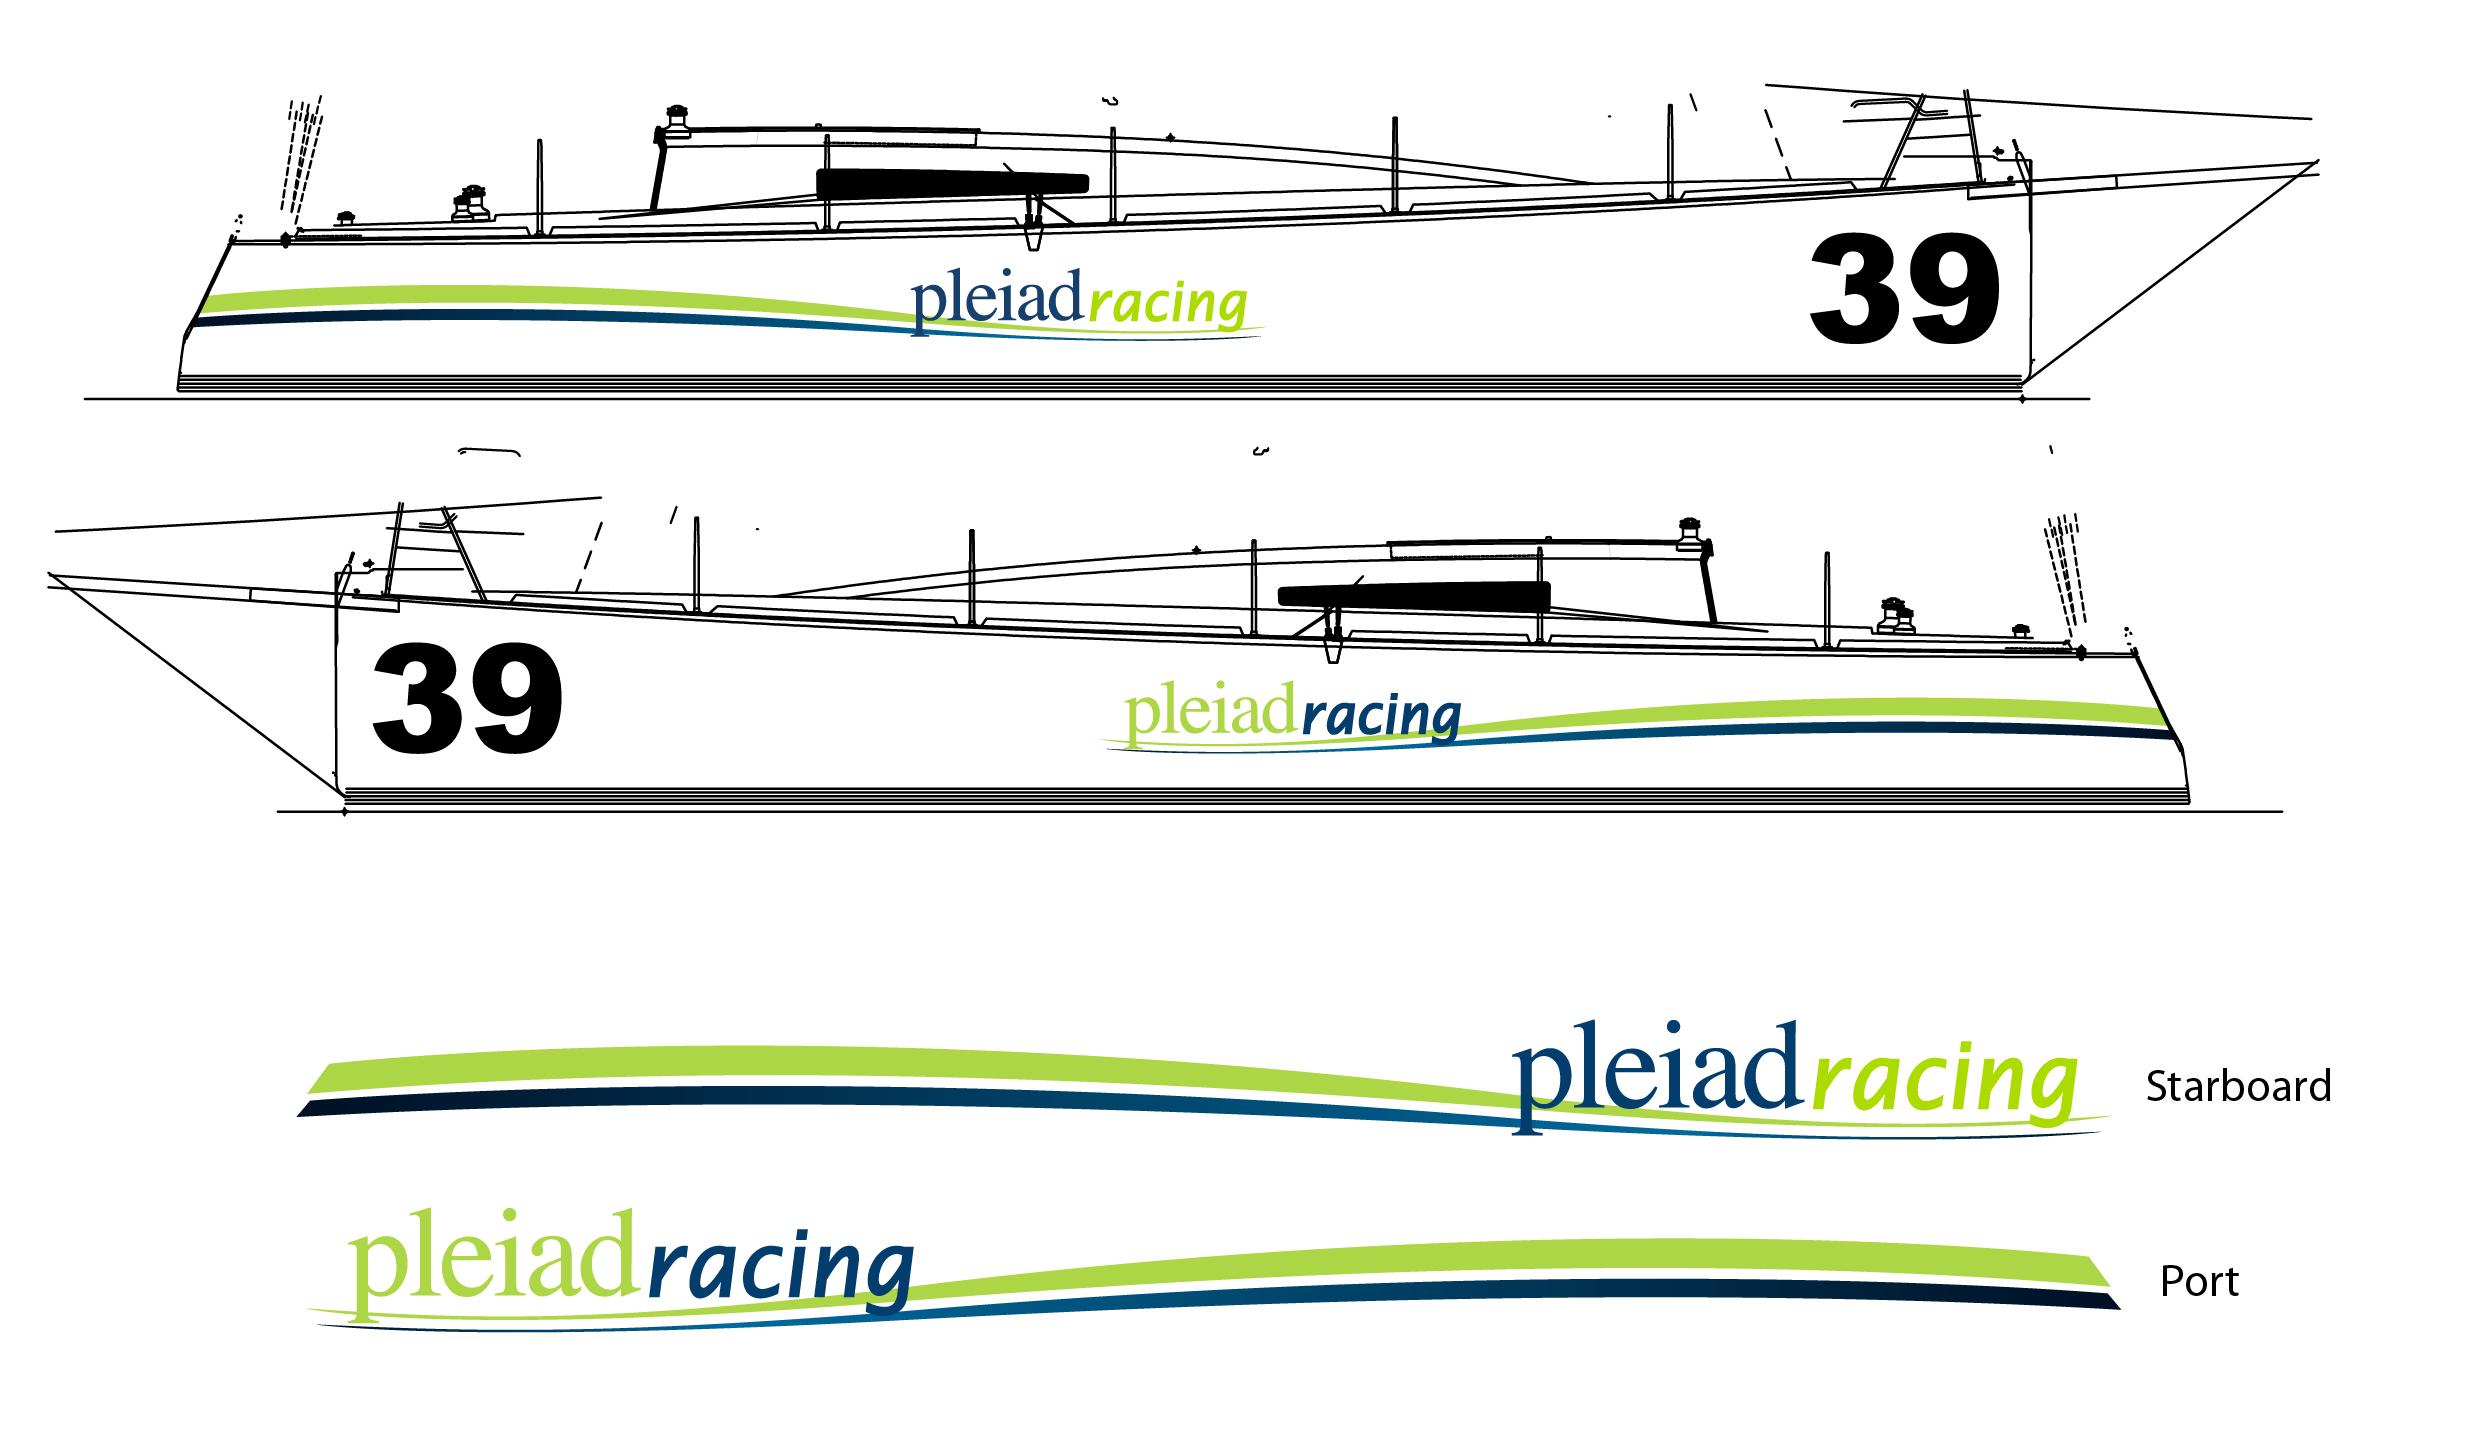 PleiadRacingDecalFinal-01.jpg